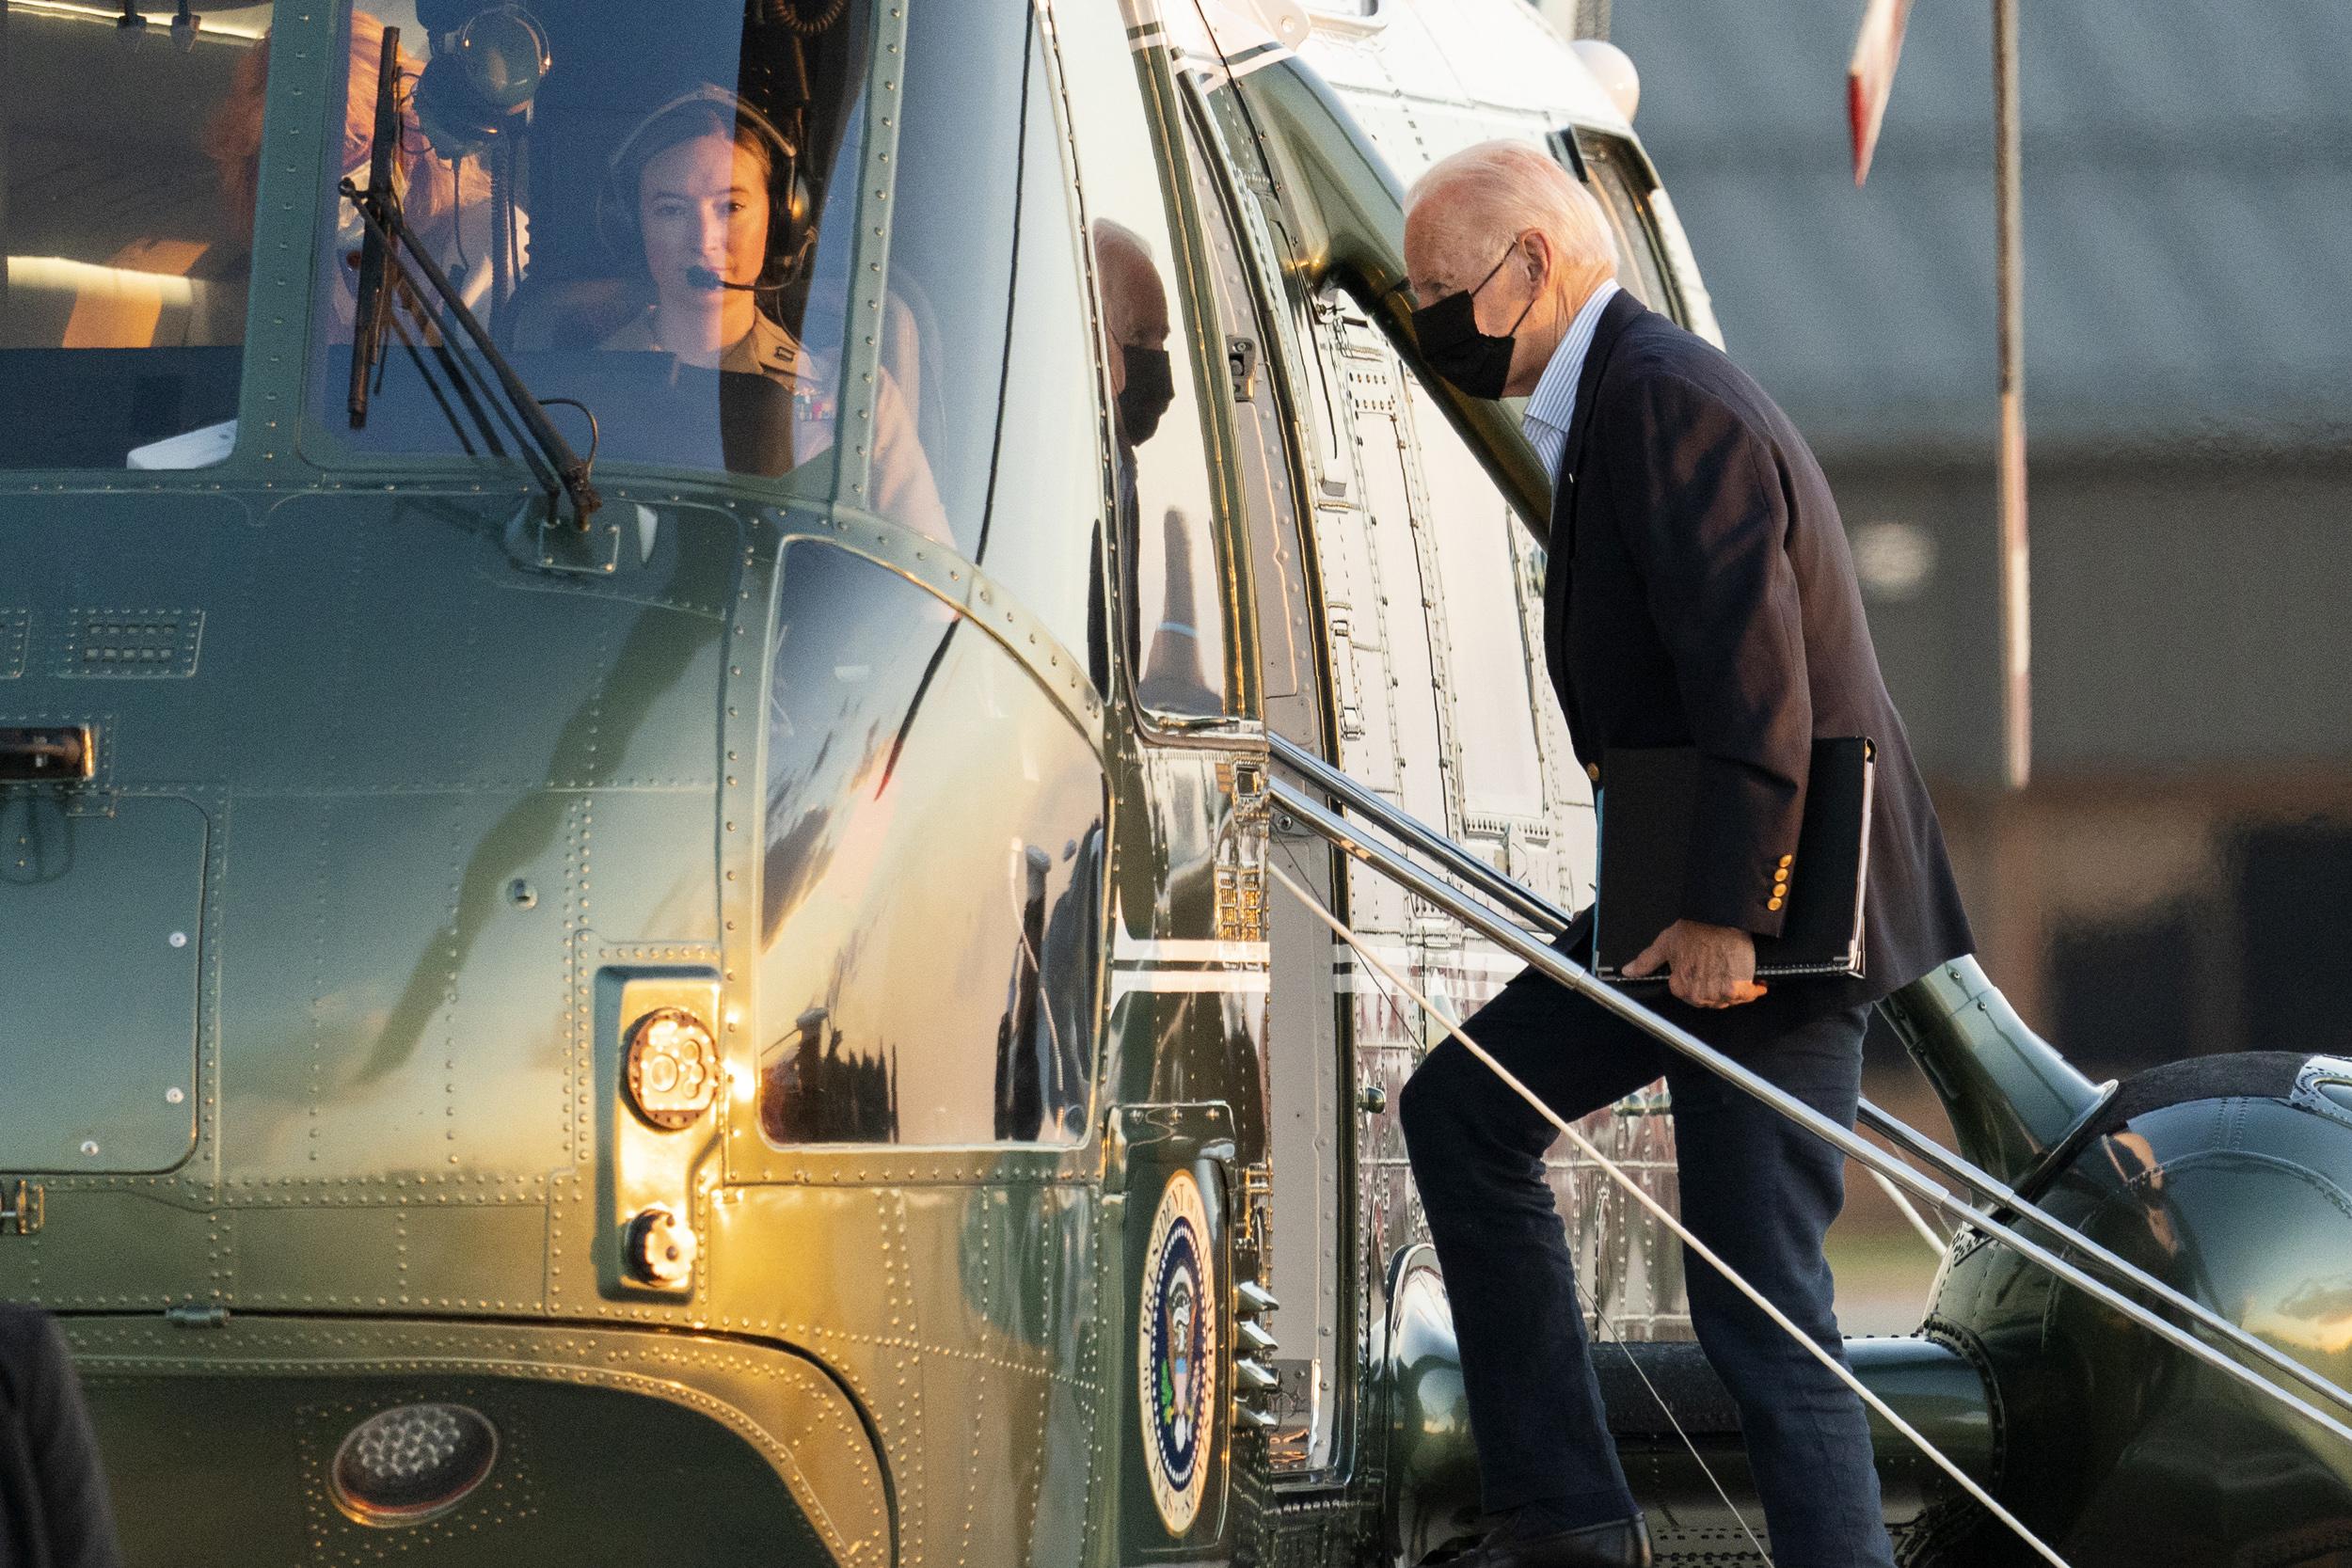 Biden to tour Hurricane Ida damage in New York and New Jersey